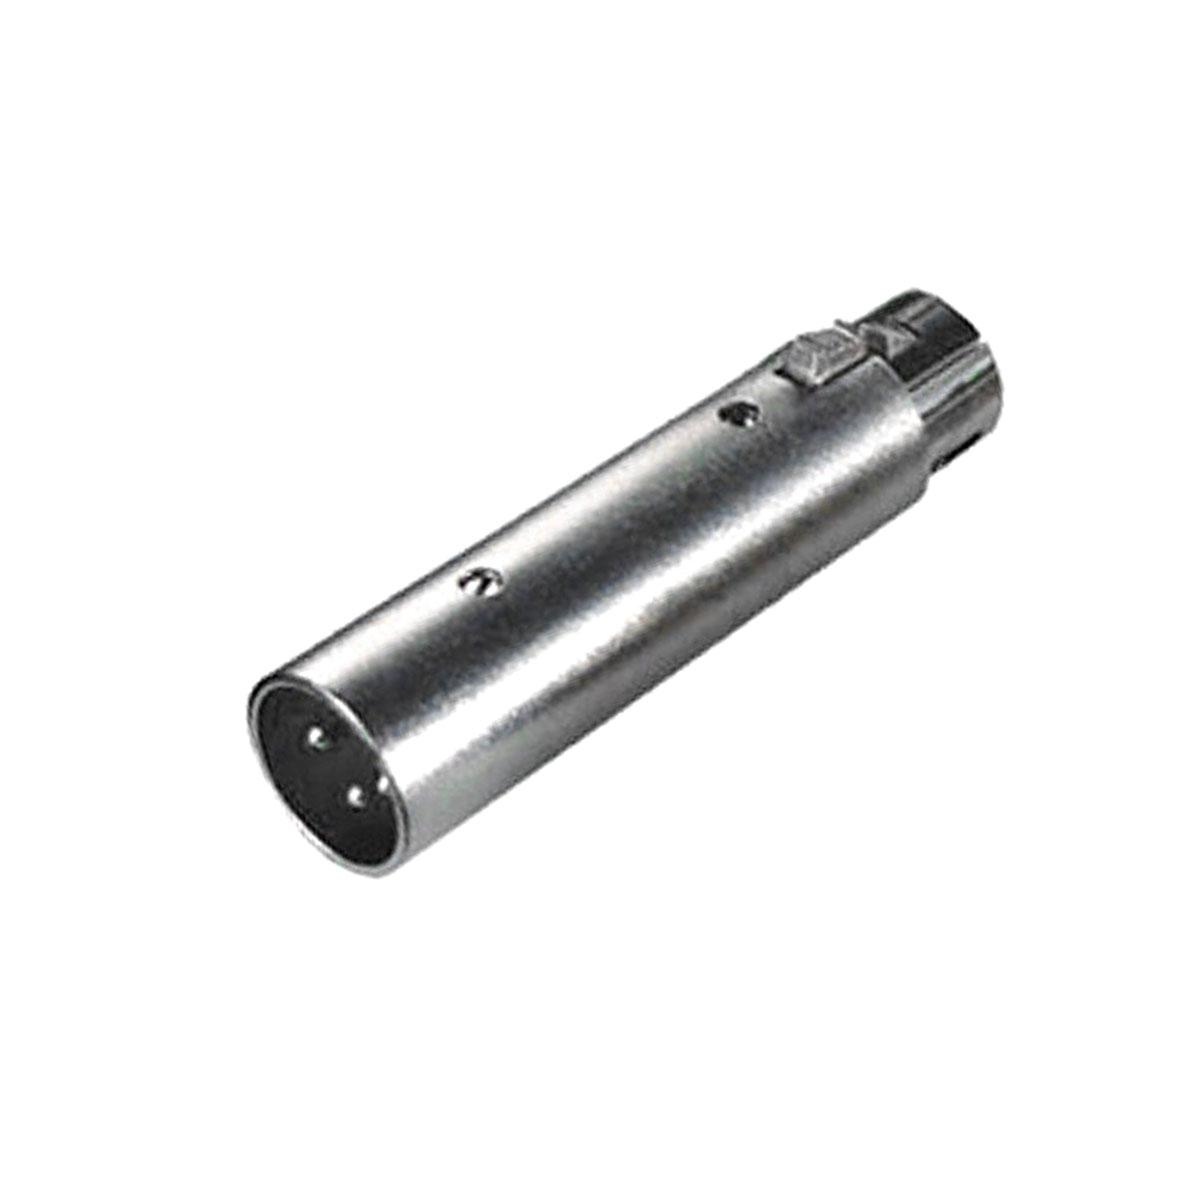 Plug Adaptador XLR-M / XLR-F c/ Trava SKC073 - CSR